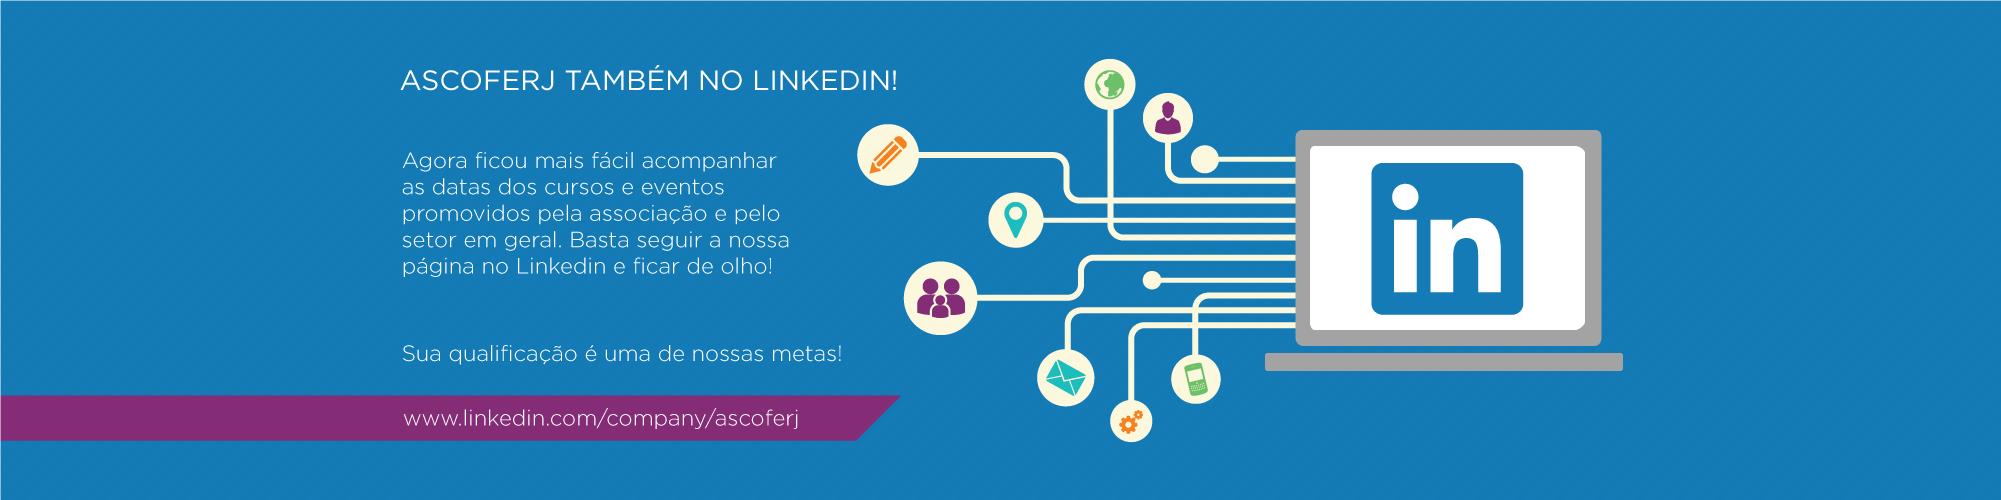 2941-Ascoferj-LinkedIn-banner-1